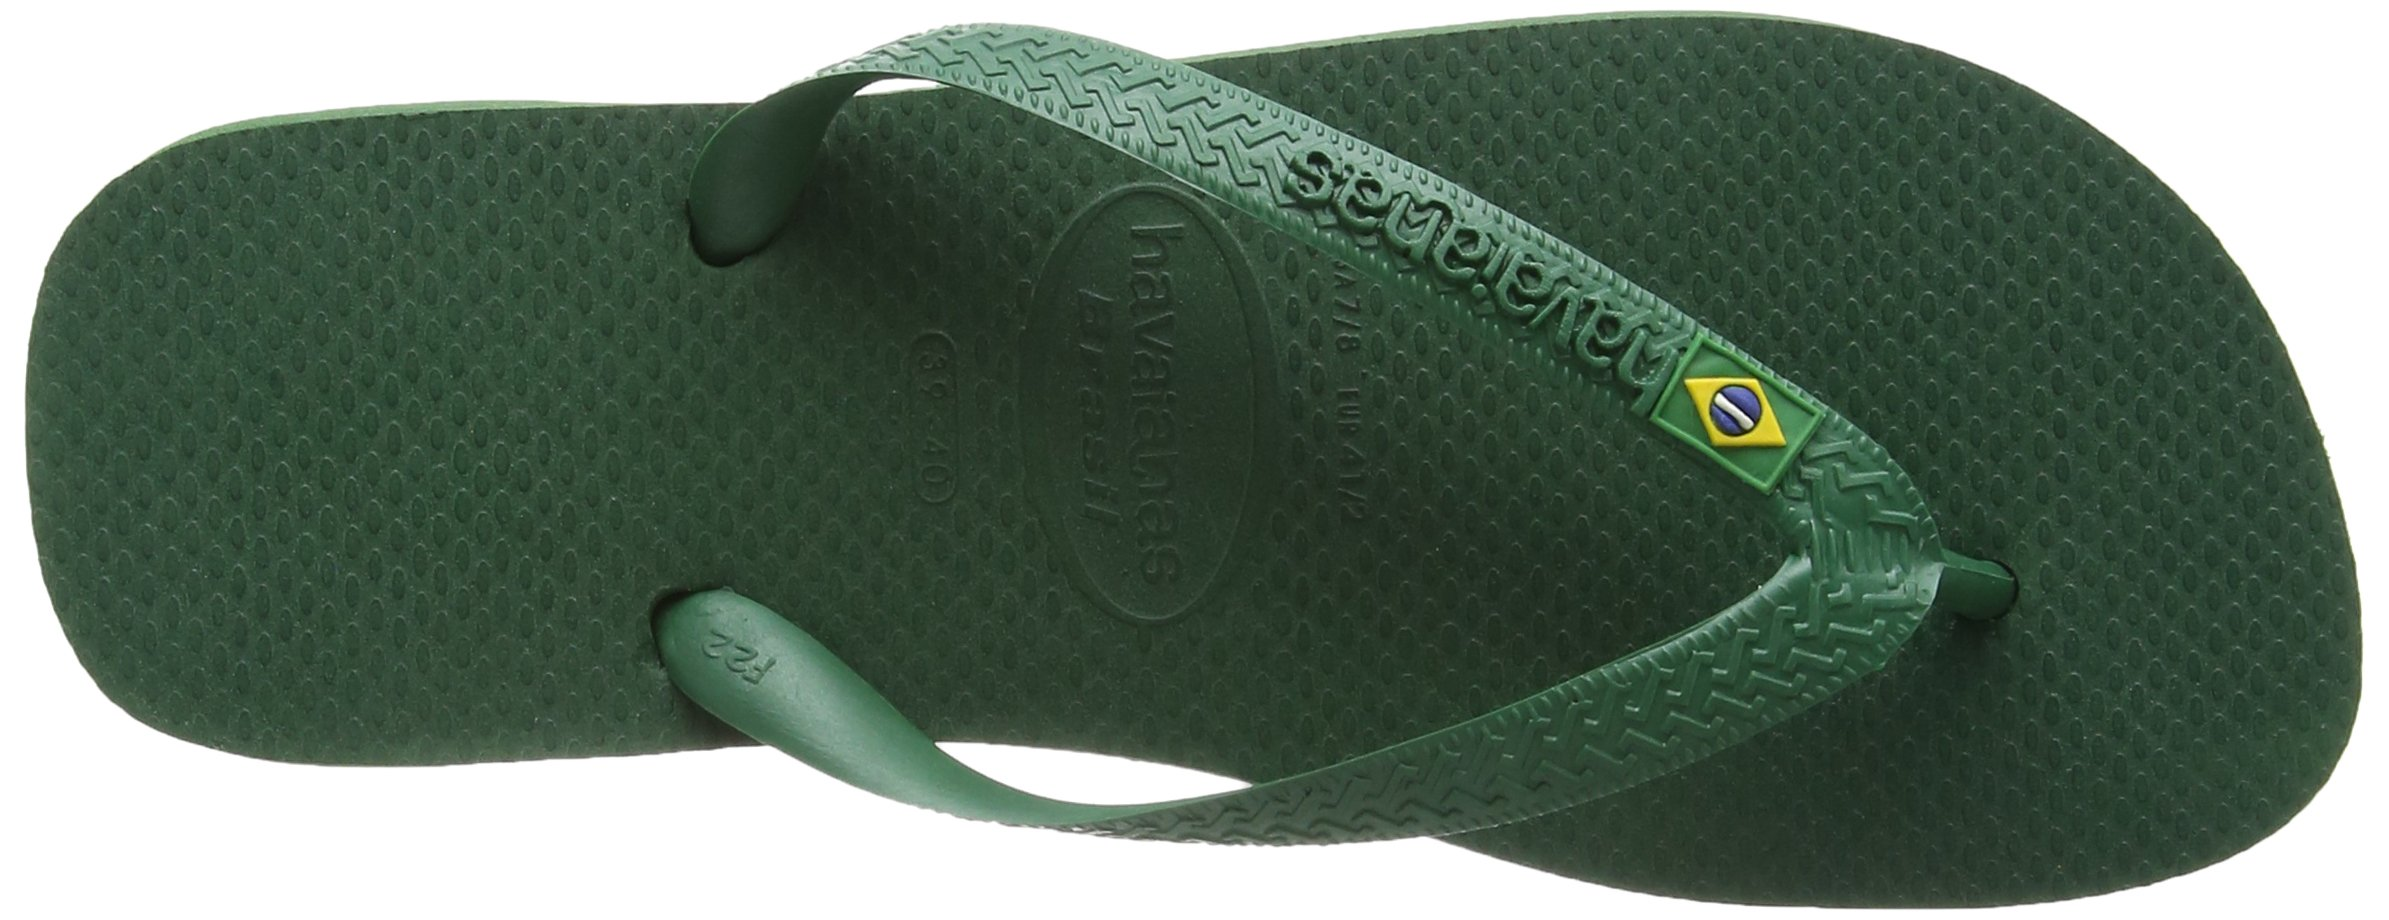 Havaianas Brasil, Unisex Adult's Flip Flops, Green (Brasil Amazonia), 3/4 UK (37/38EU) (35/36 BR) by Havaianas (Image #9)